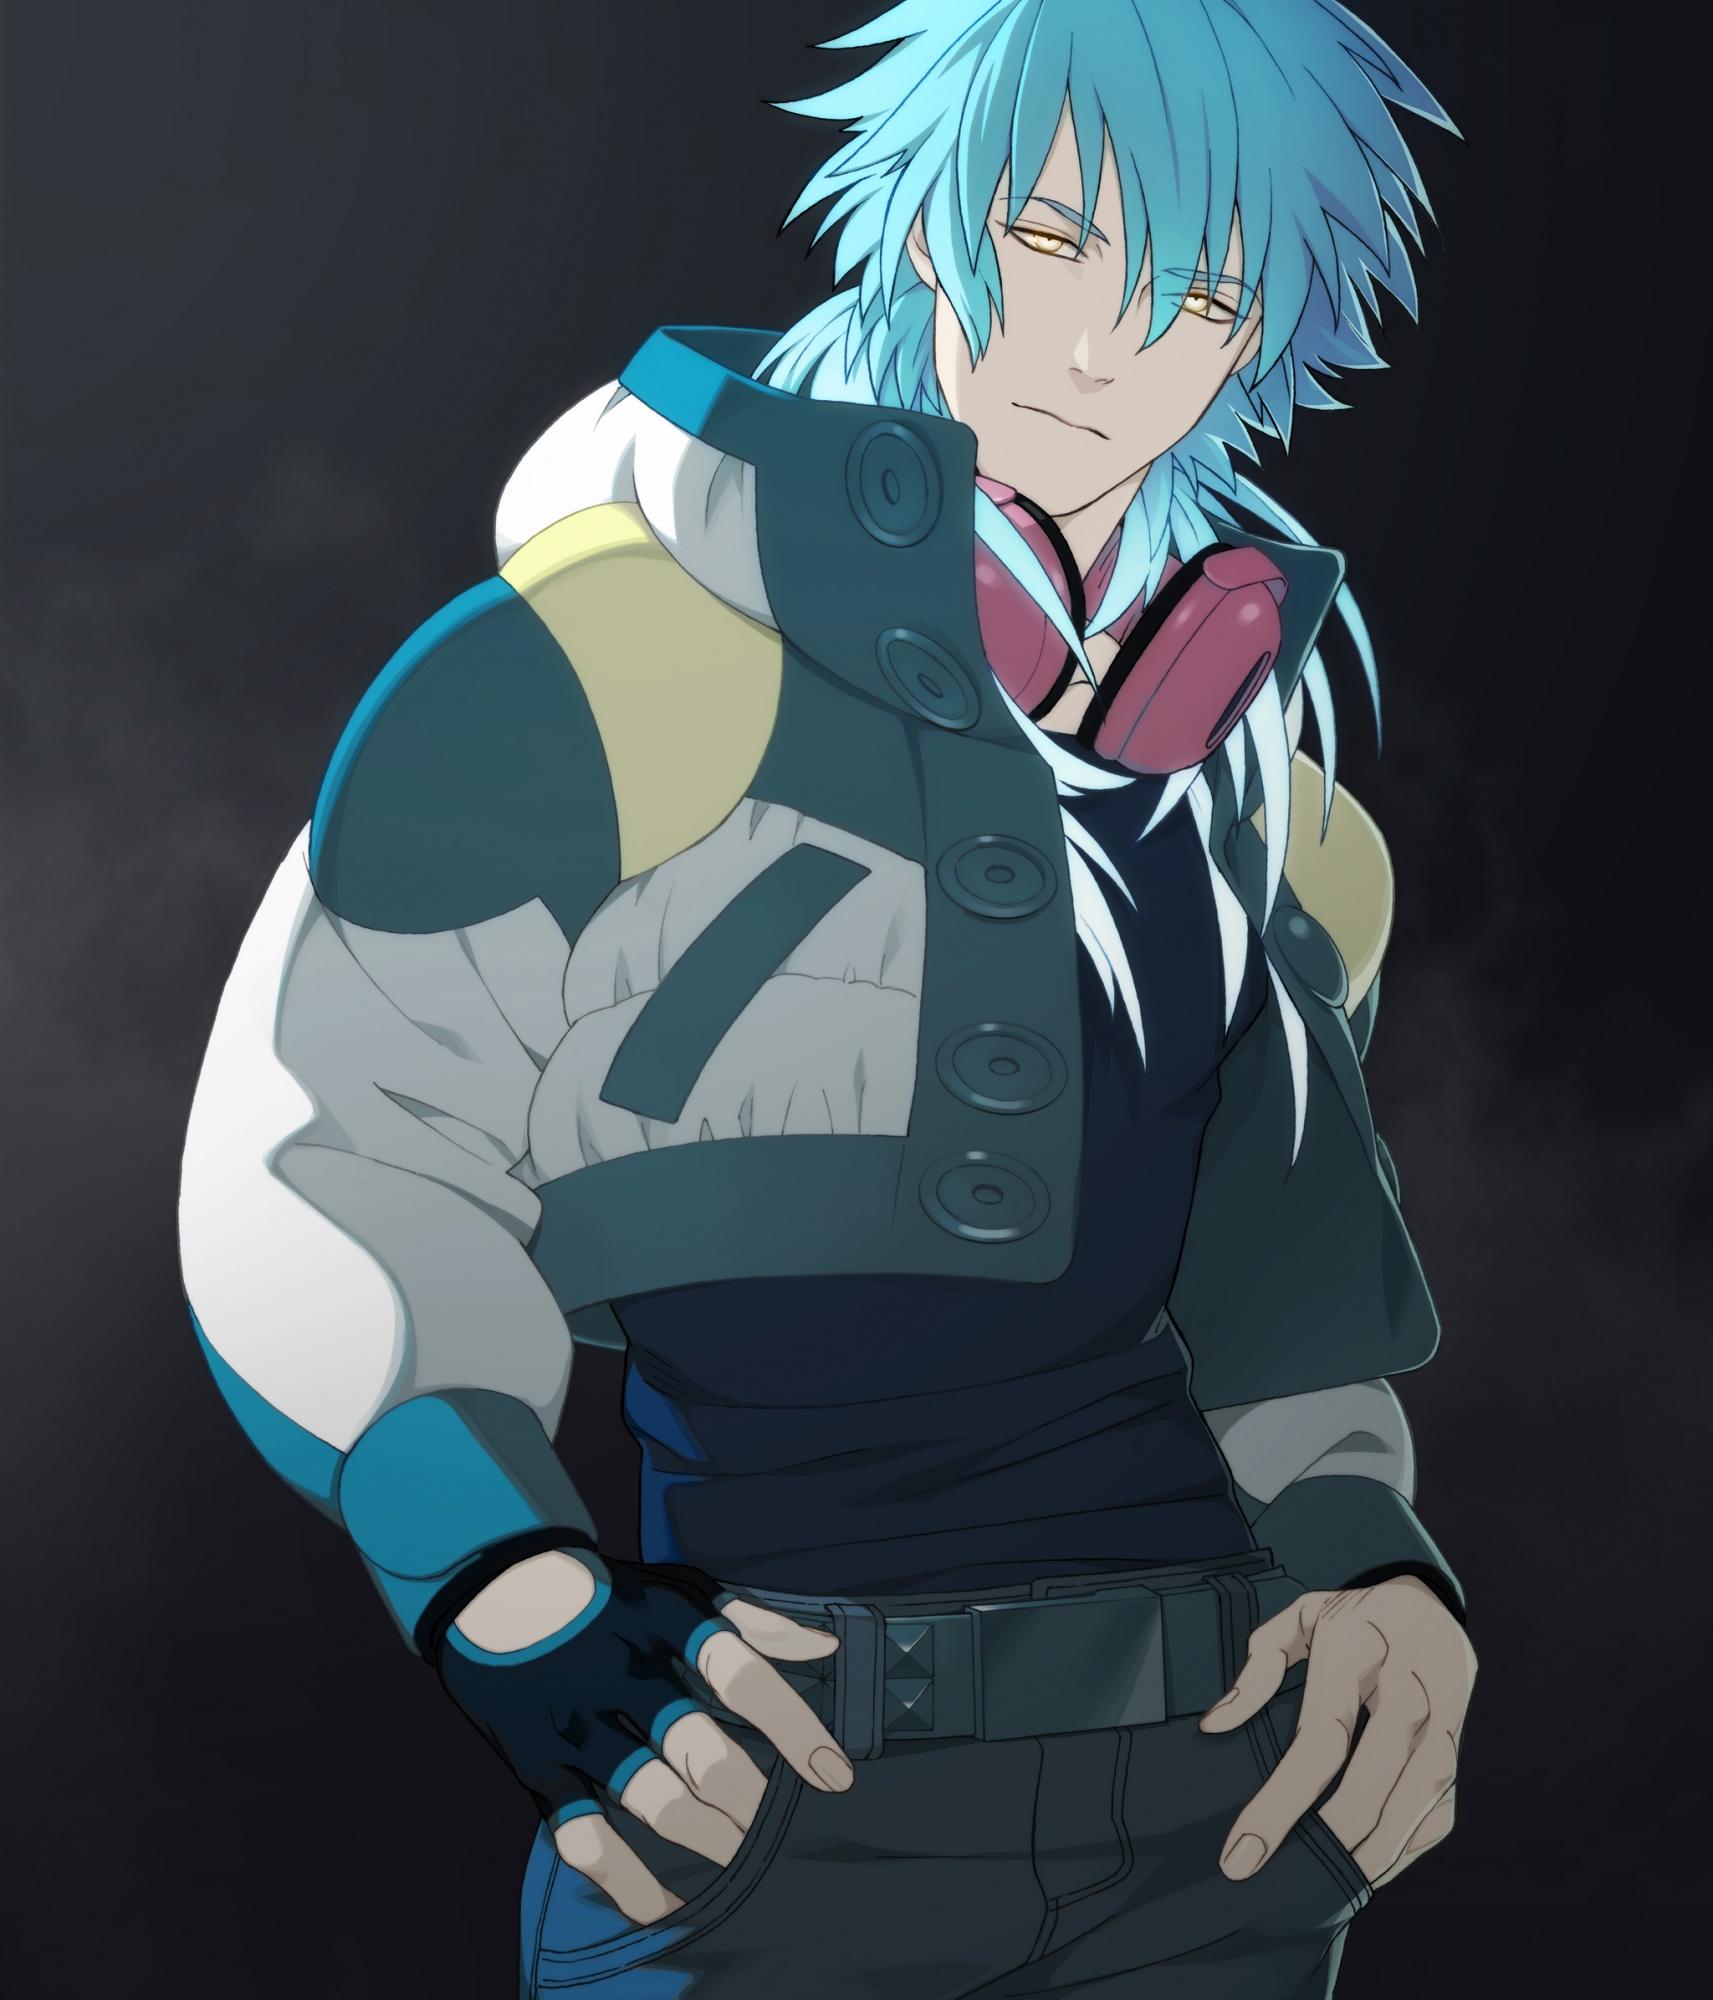 Anime Characters Are Not White : Seragaki aoba my anime shelf